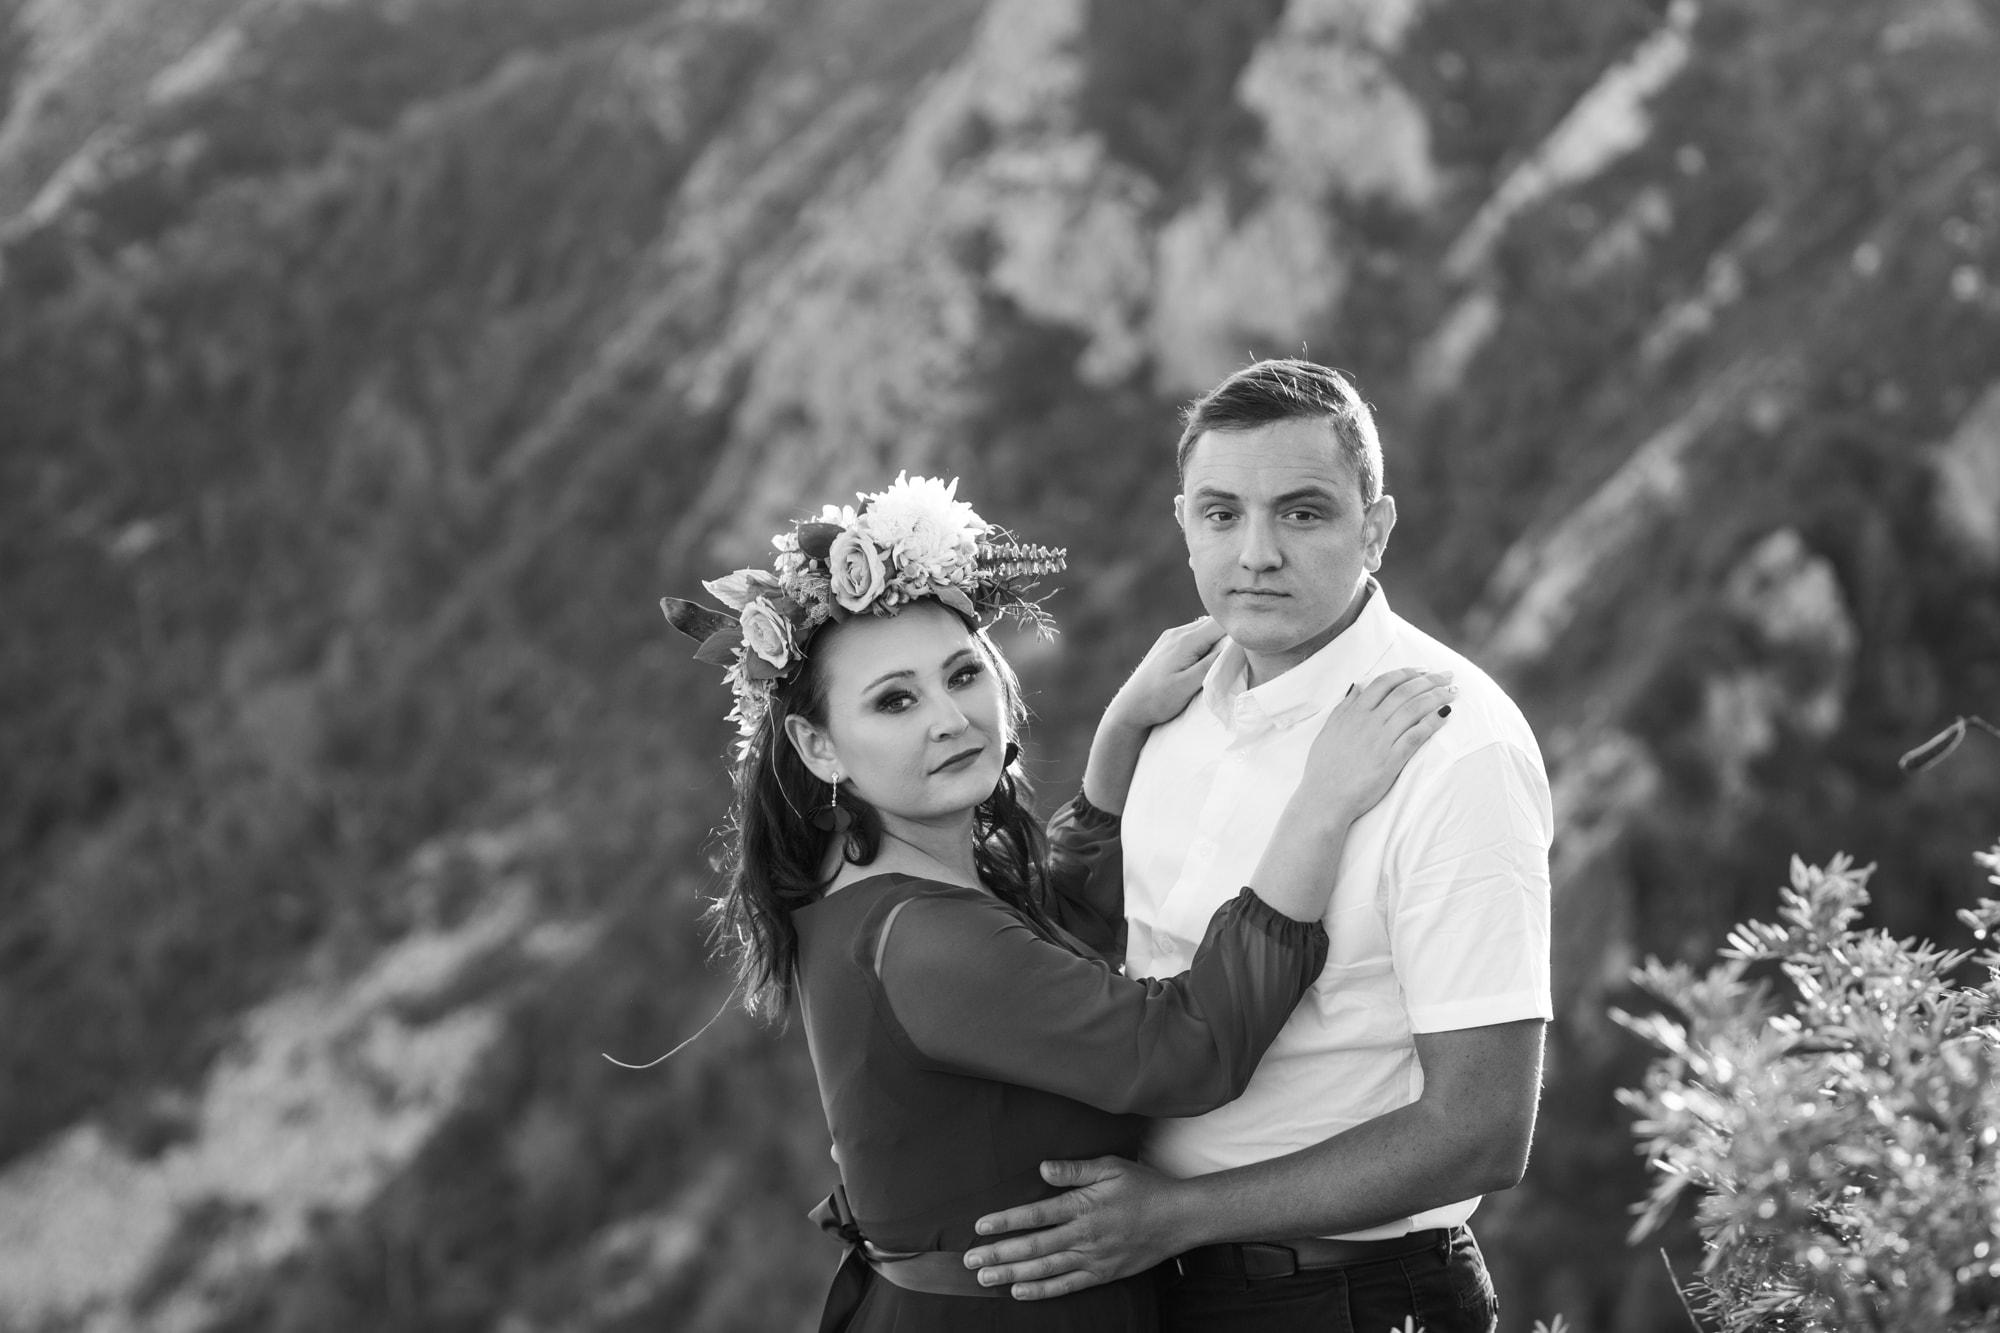 jesann-freddie-kranshoek-engagement-June-Richards-Photography-Destination-Weddings-Elopements-Garden-Route-47